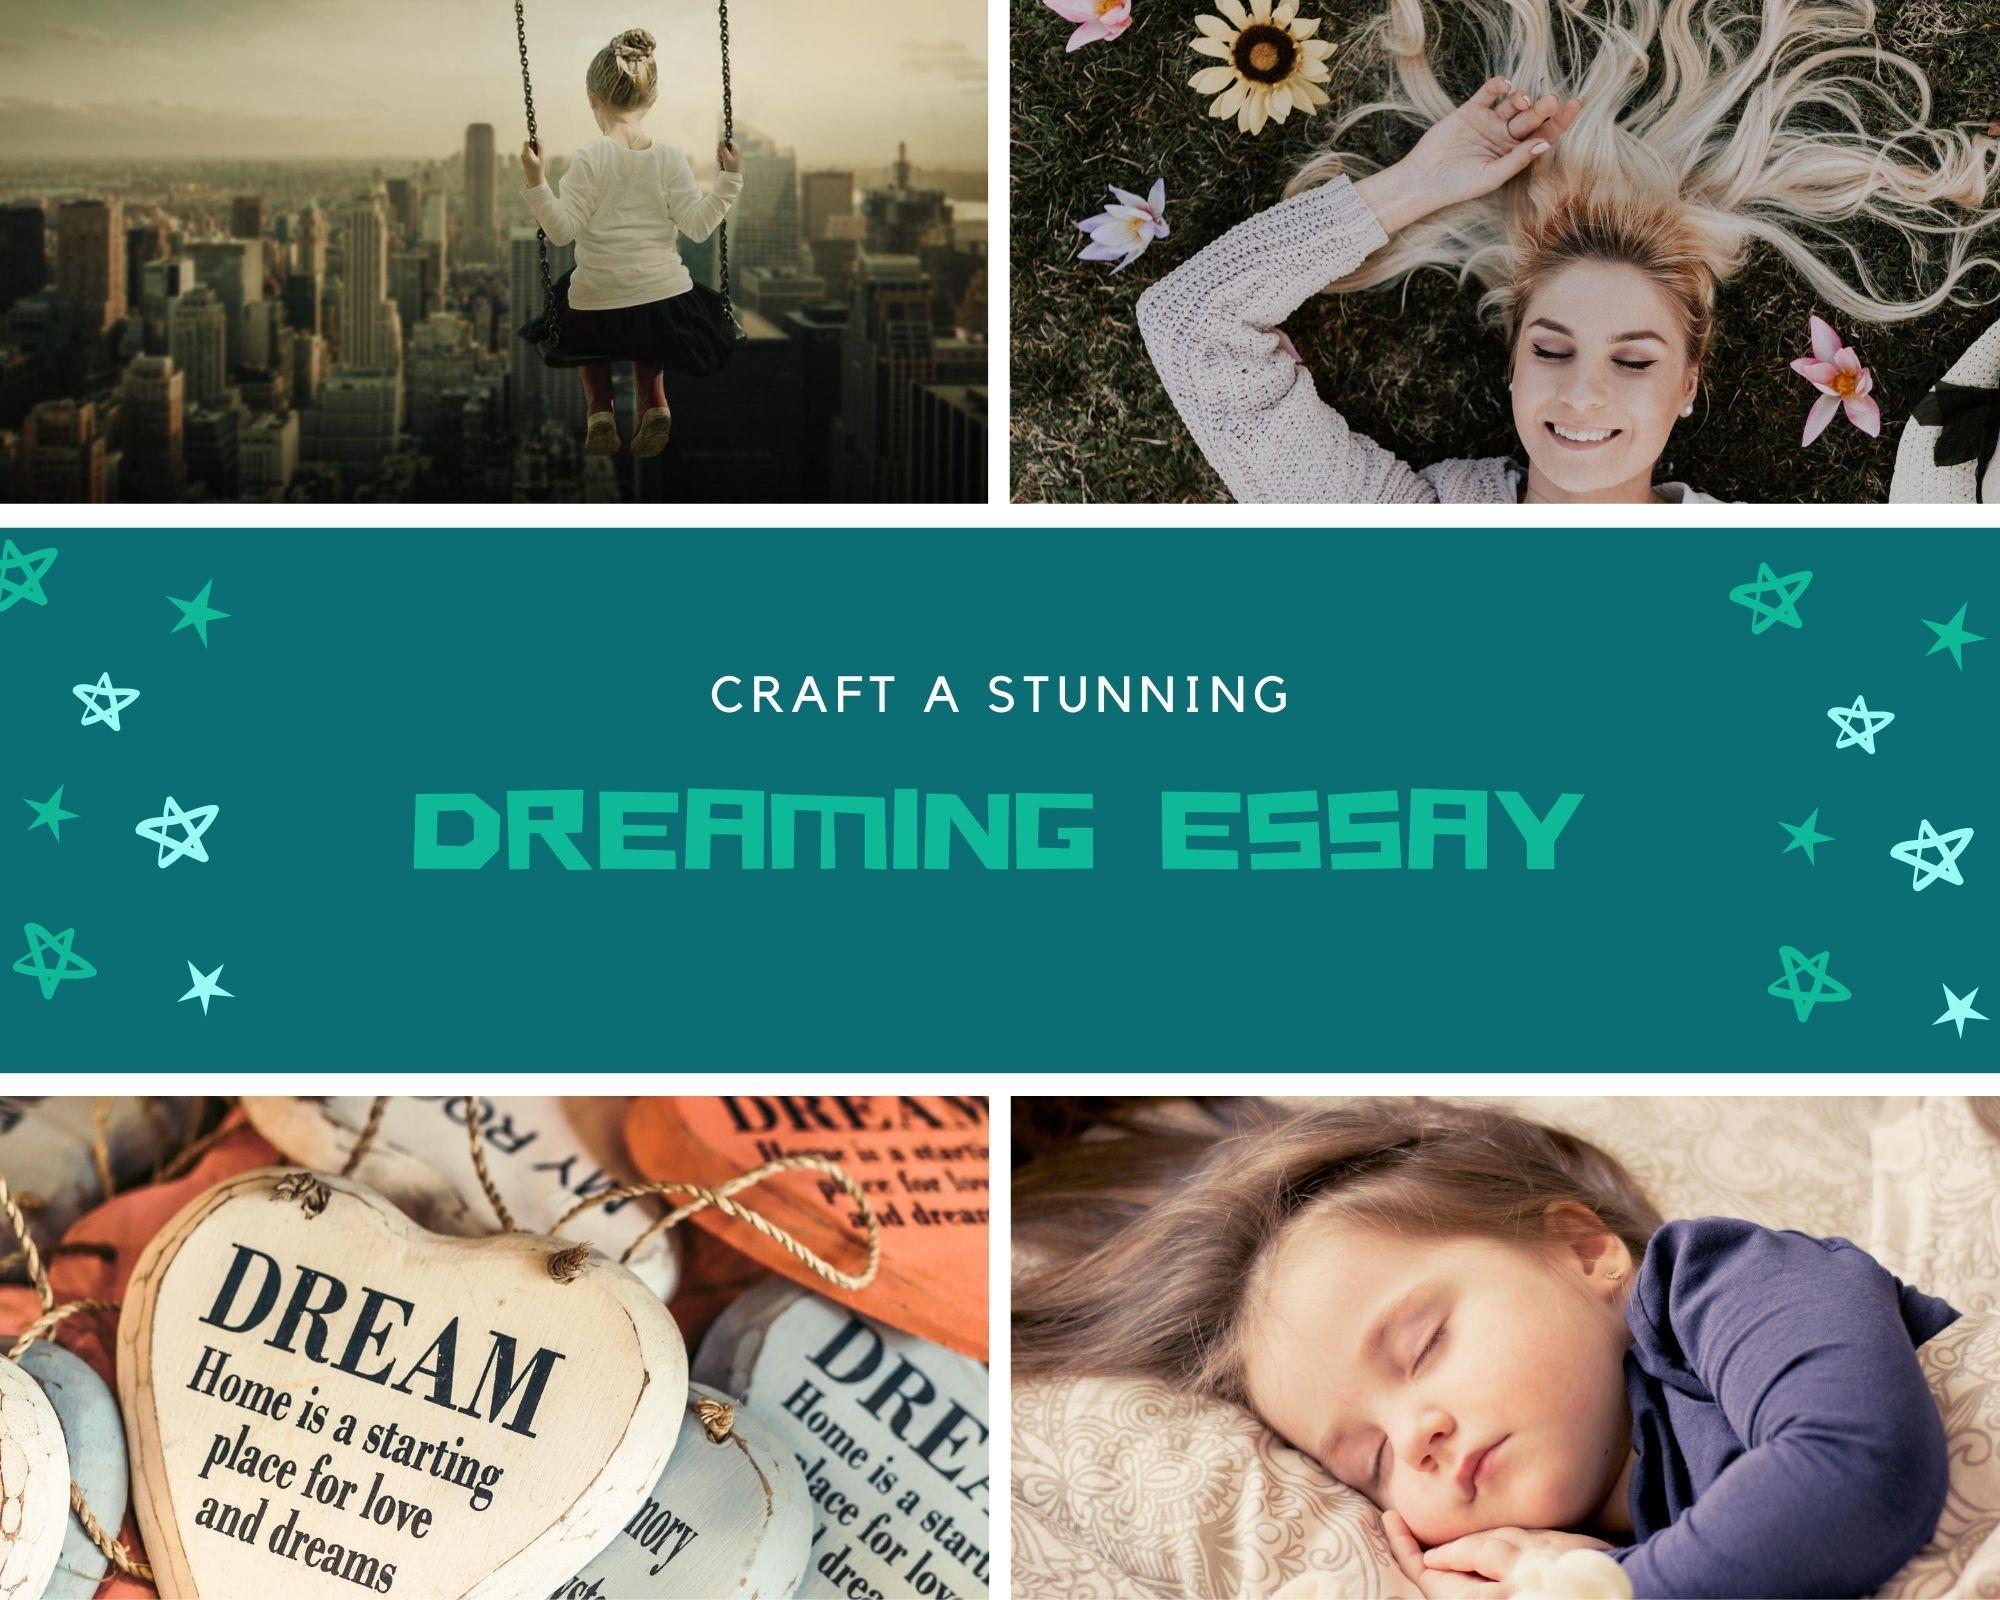 Dreaming Essay